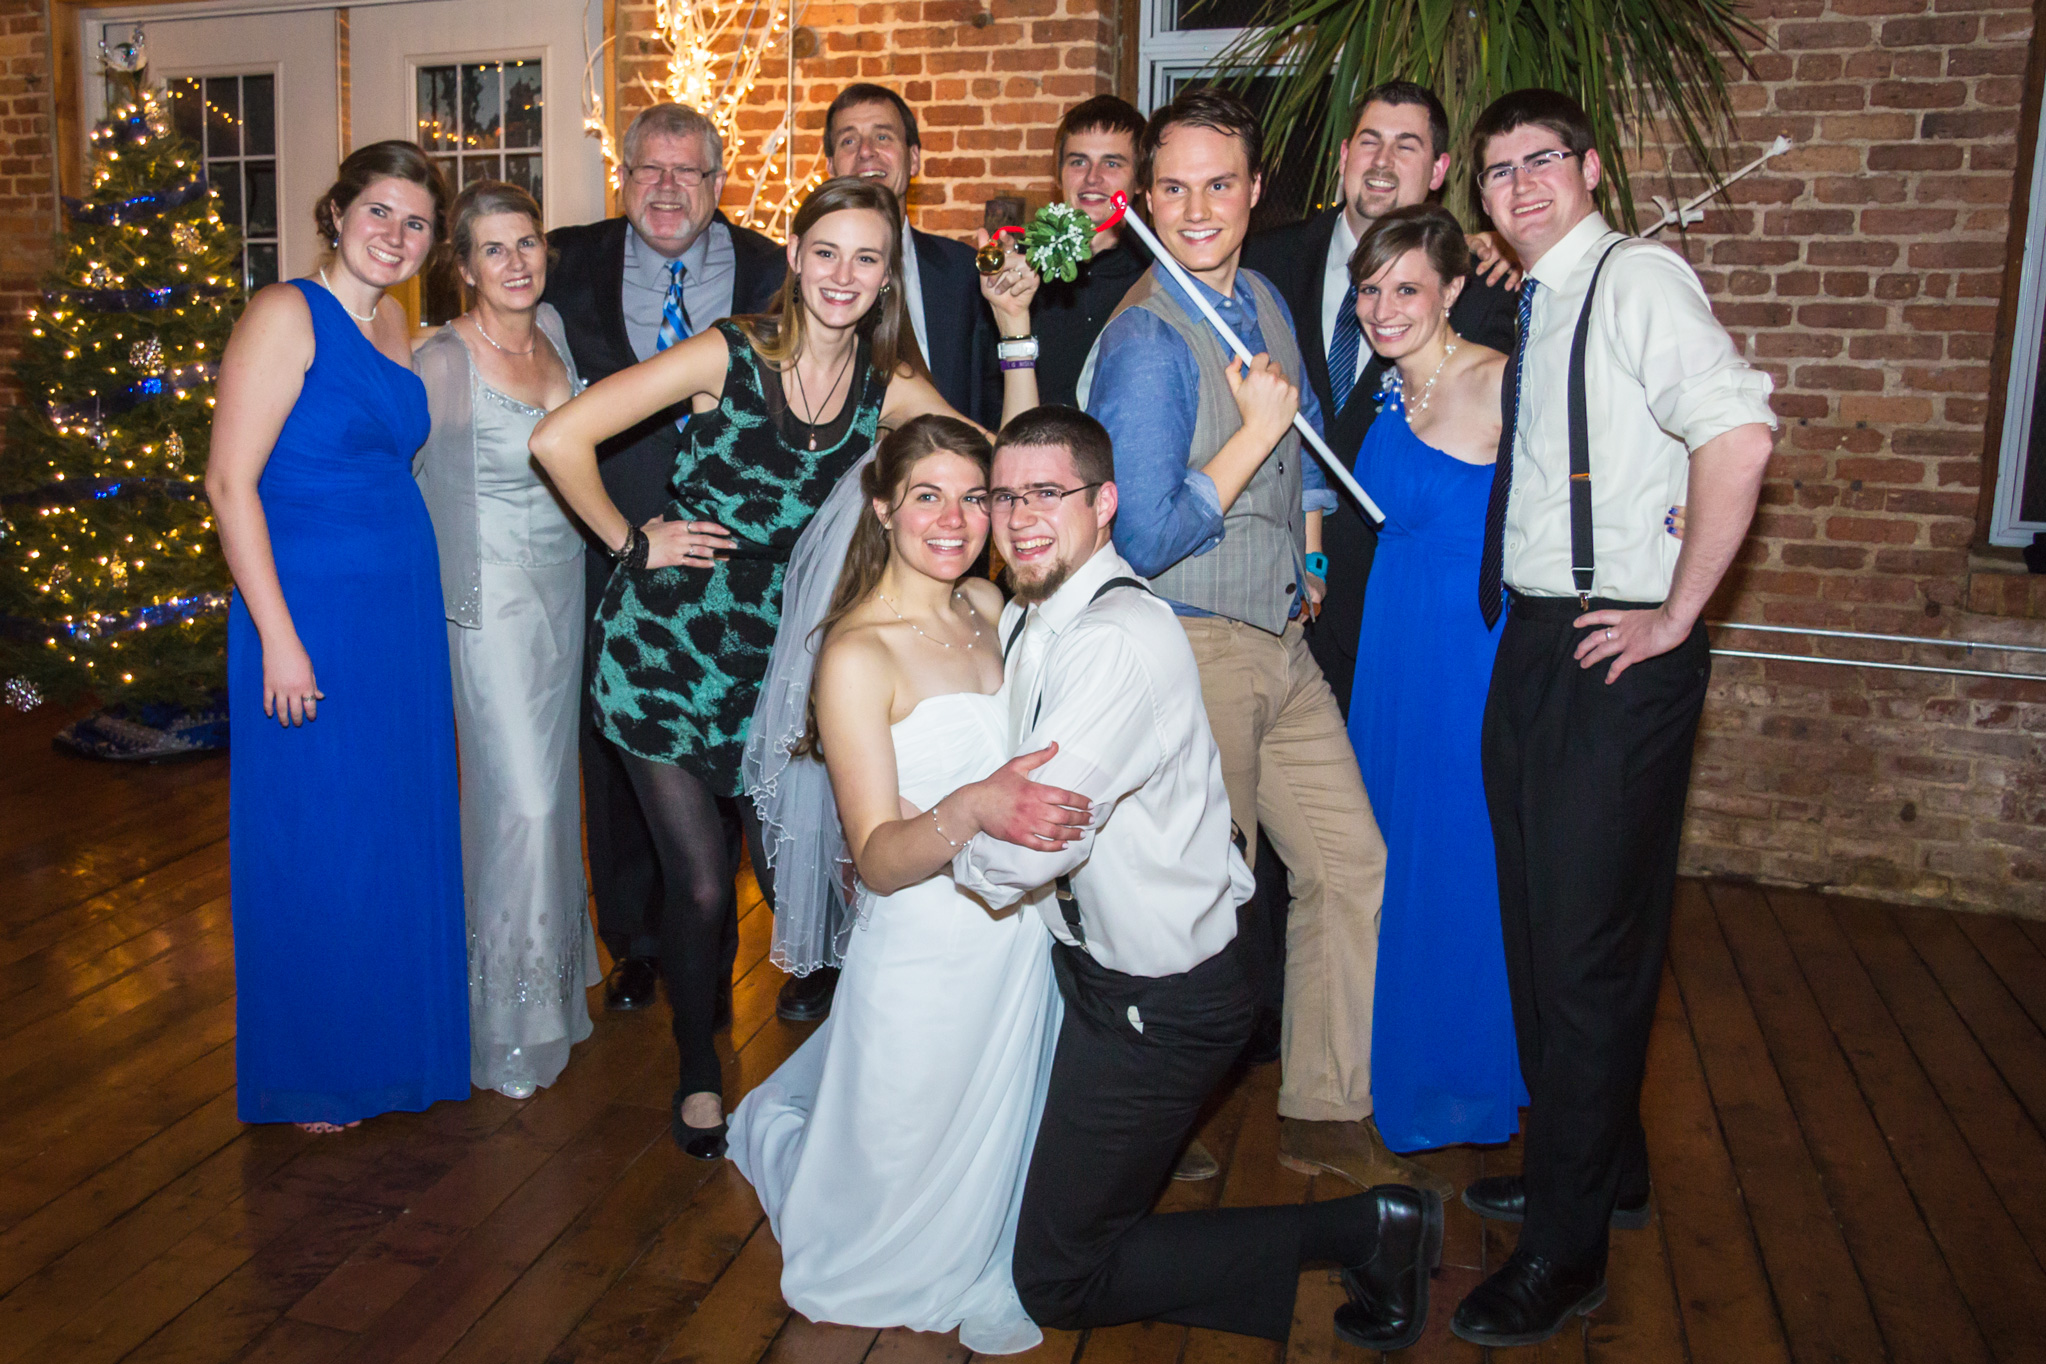 ben_sierra_wedding_dancing_-ring_reception_3.jpg